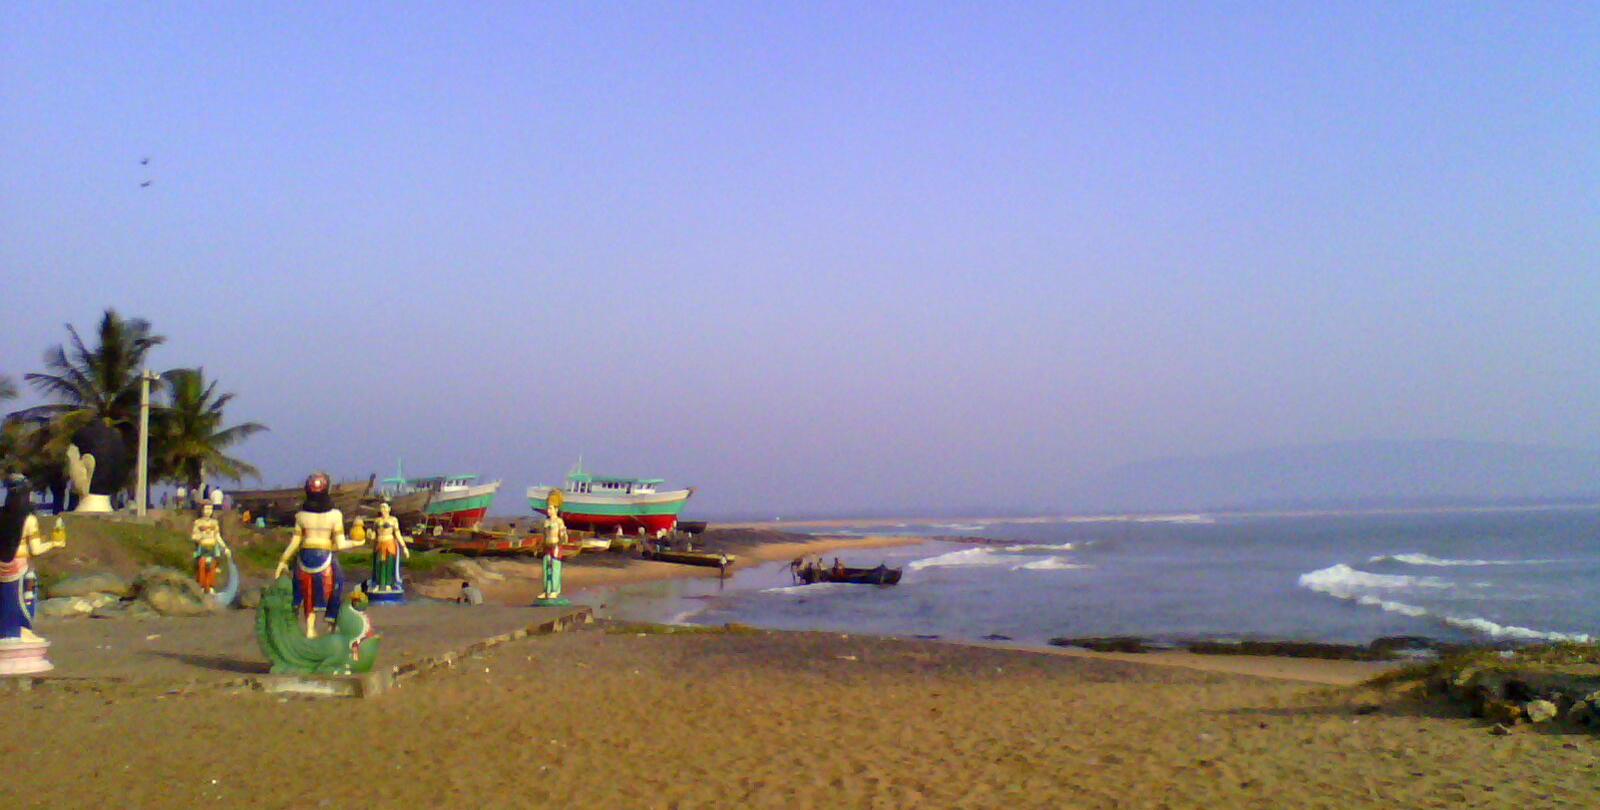 Things To Do At The Bheemili Beach